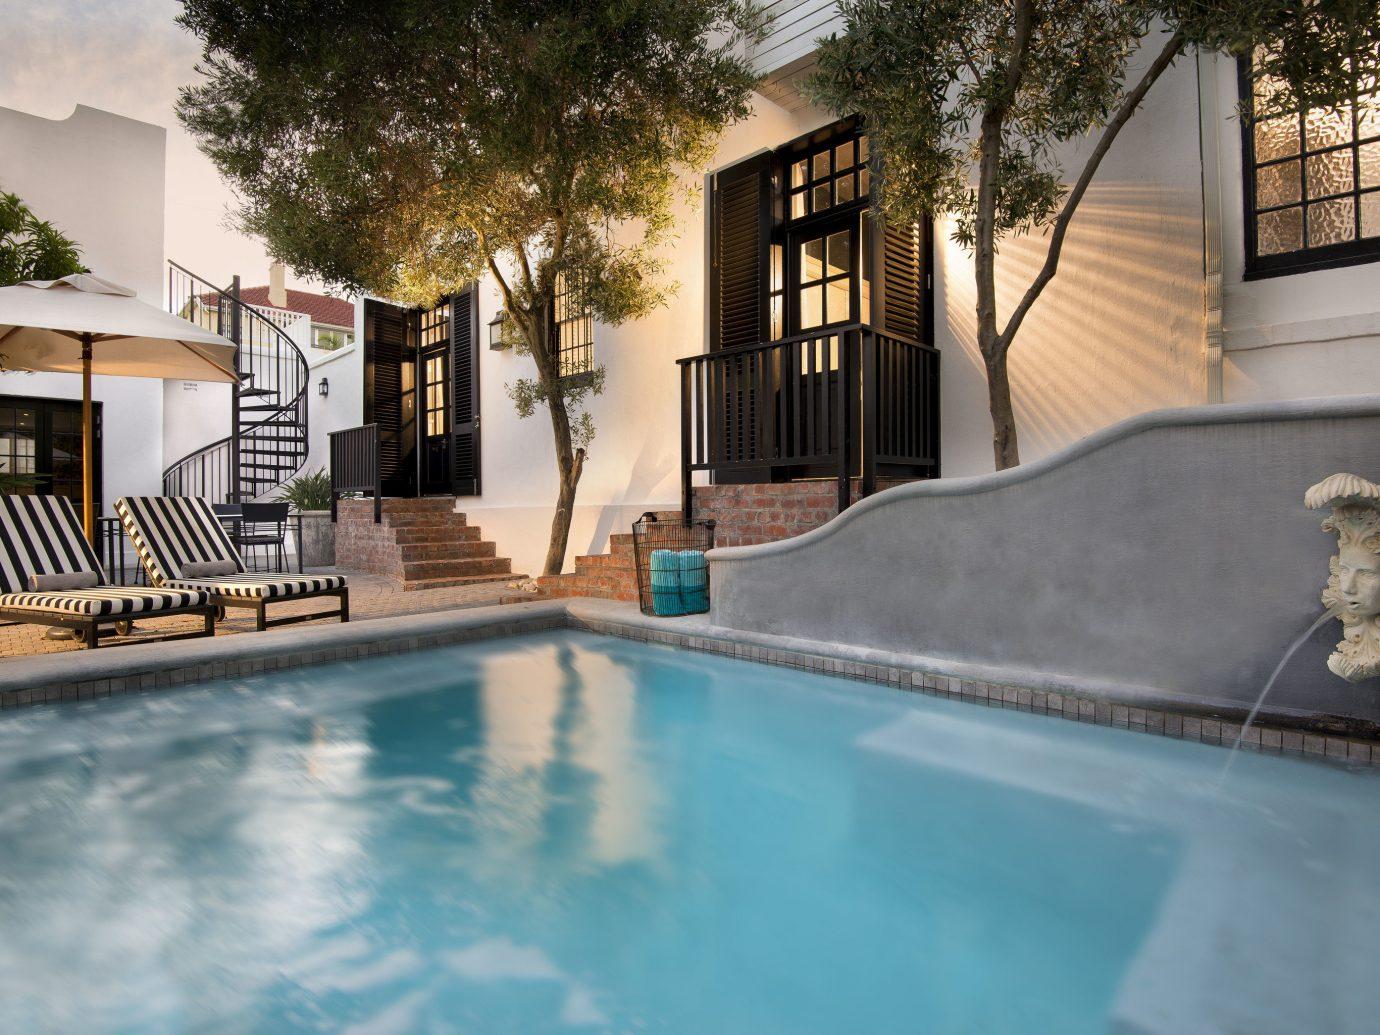 Hotels outdoor swimming pool property estate house home backyard Villa mansion Resort real estate condominium Courtyard